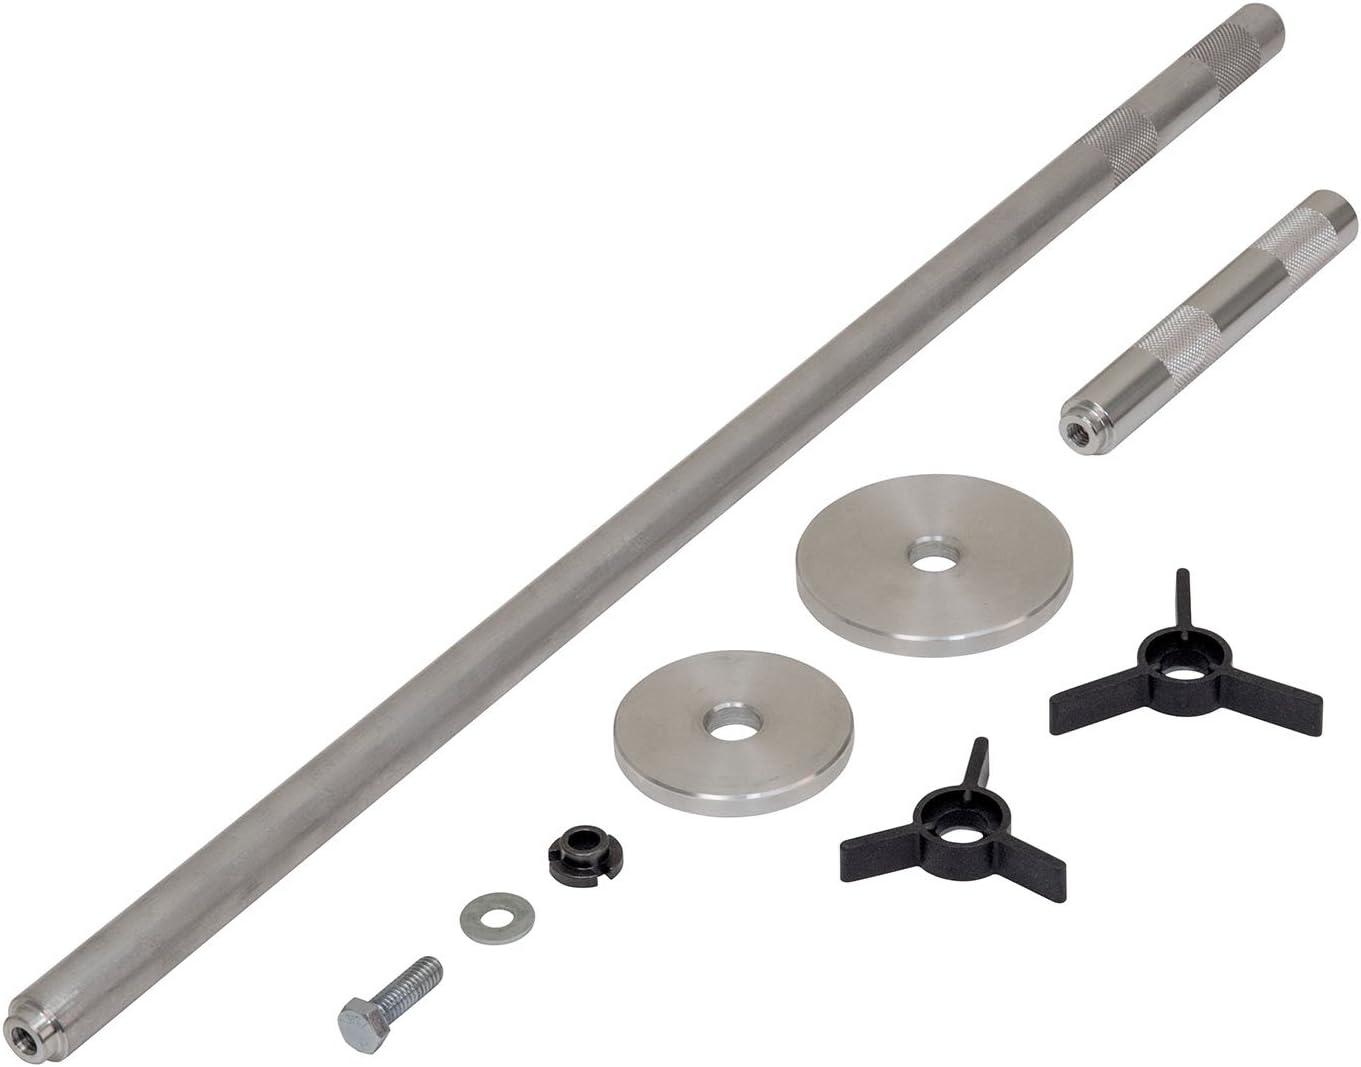 OEMTOOLS 25082 Universal Seal Installer Kit